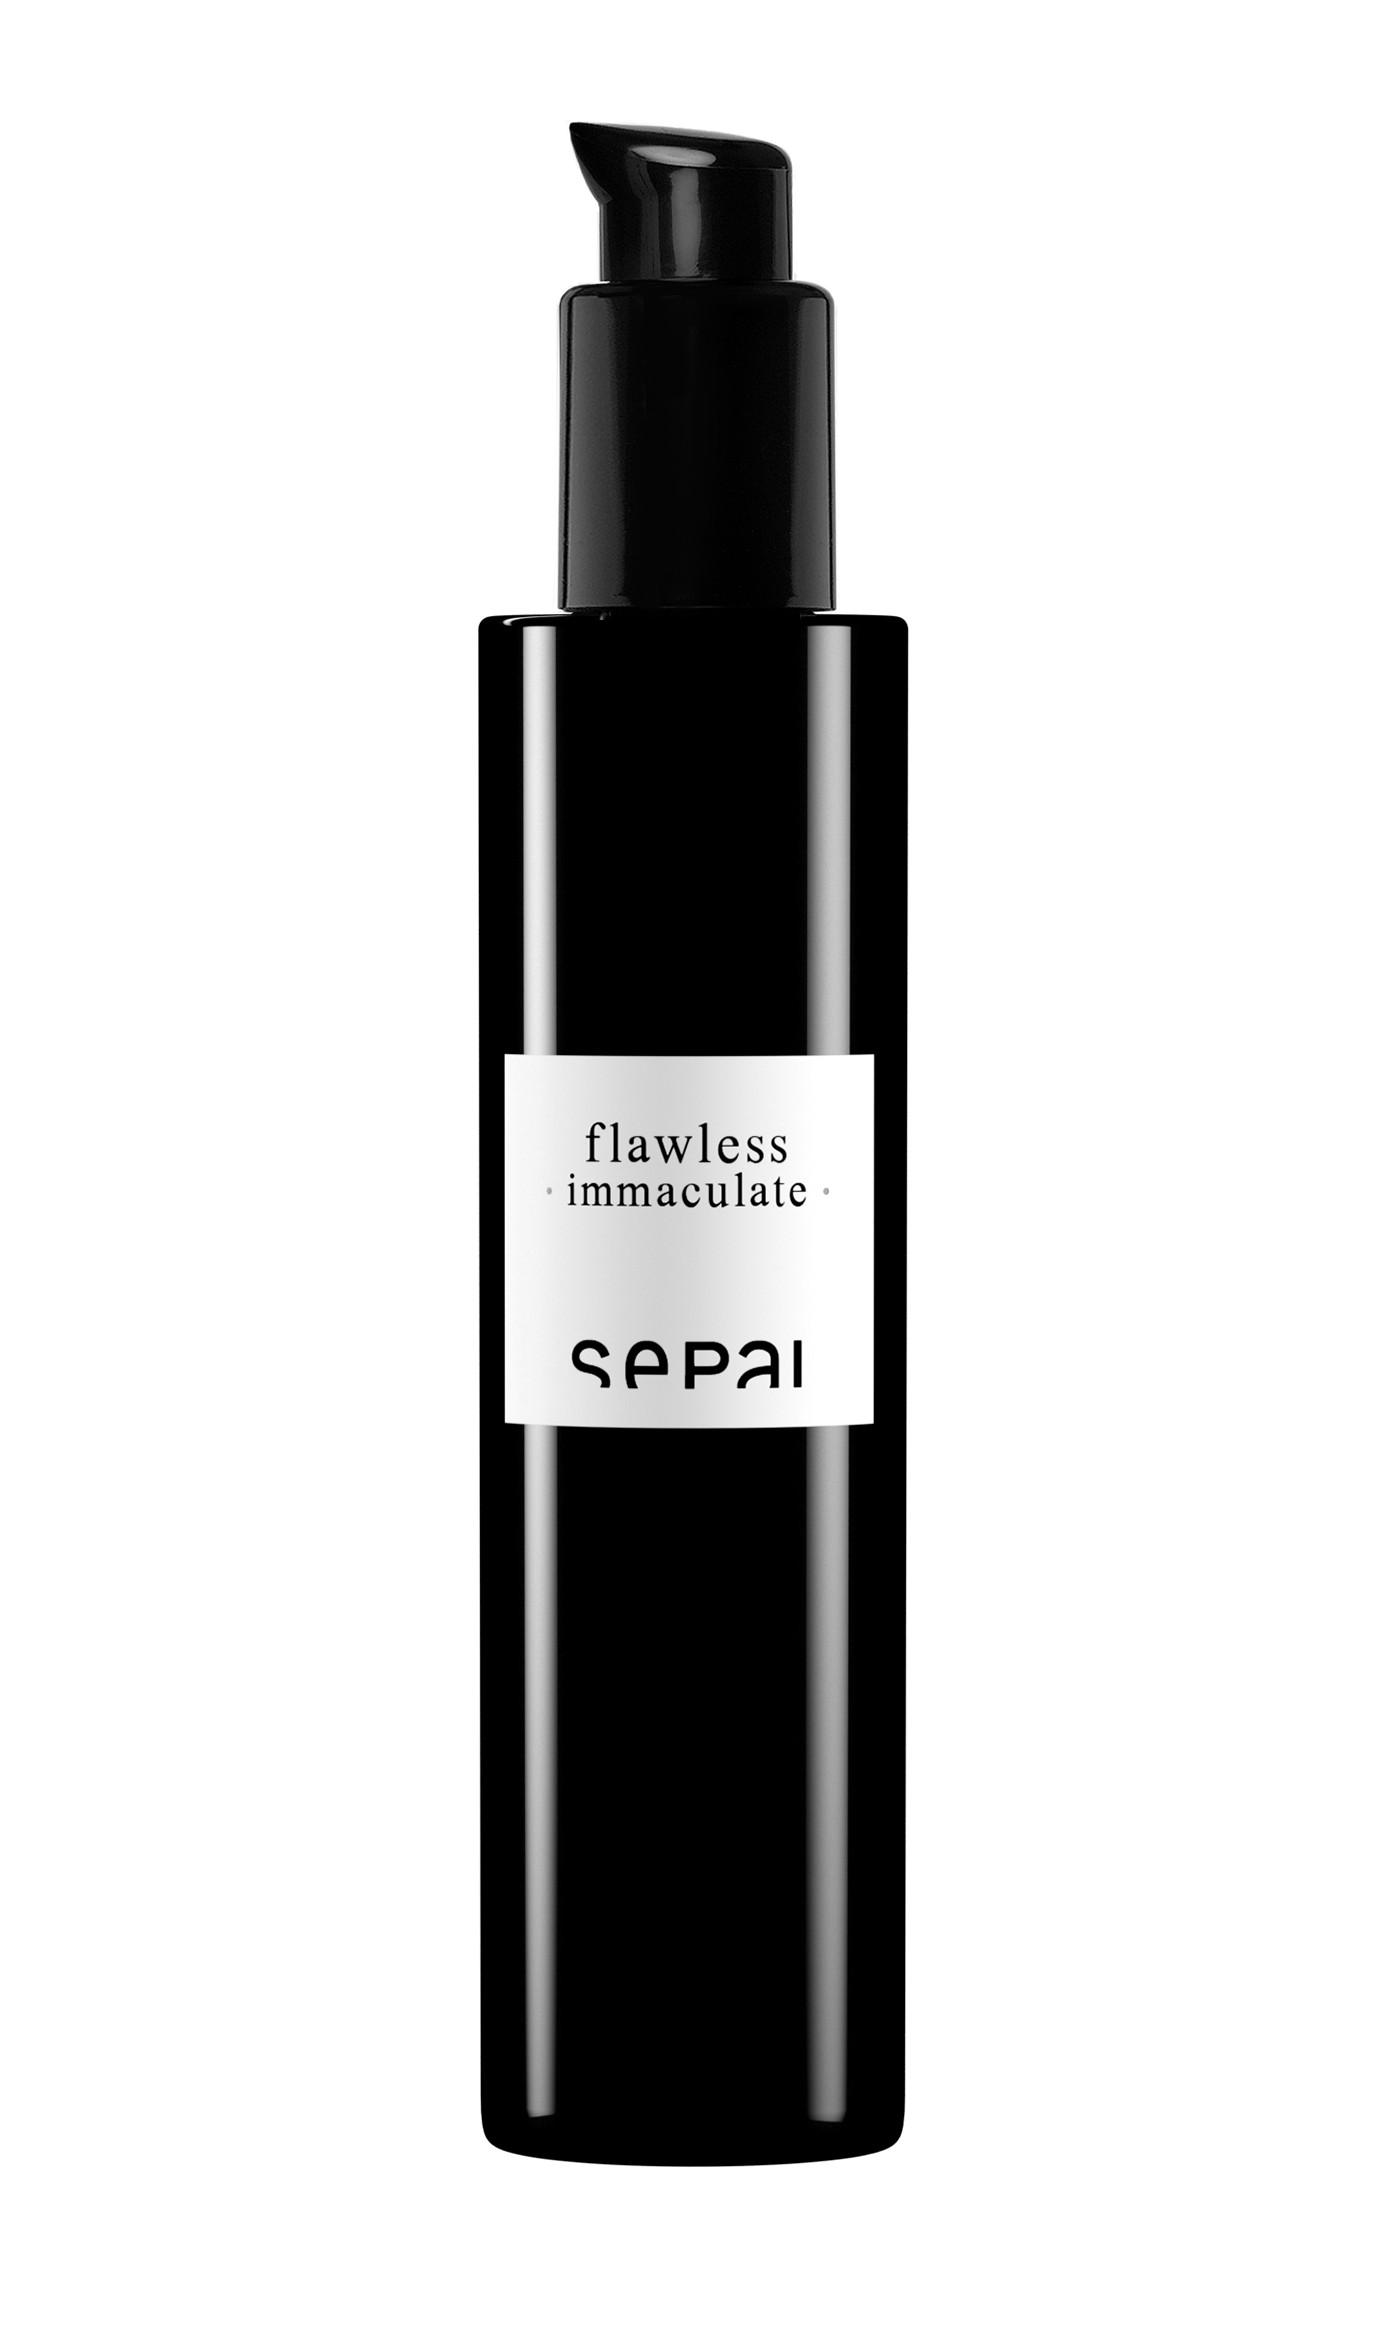 Flawless Immaculate brightener moisturiser SPF50 - SEPAI